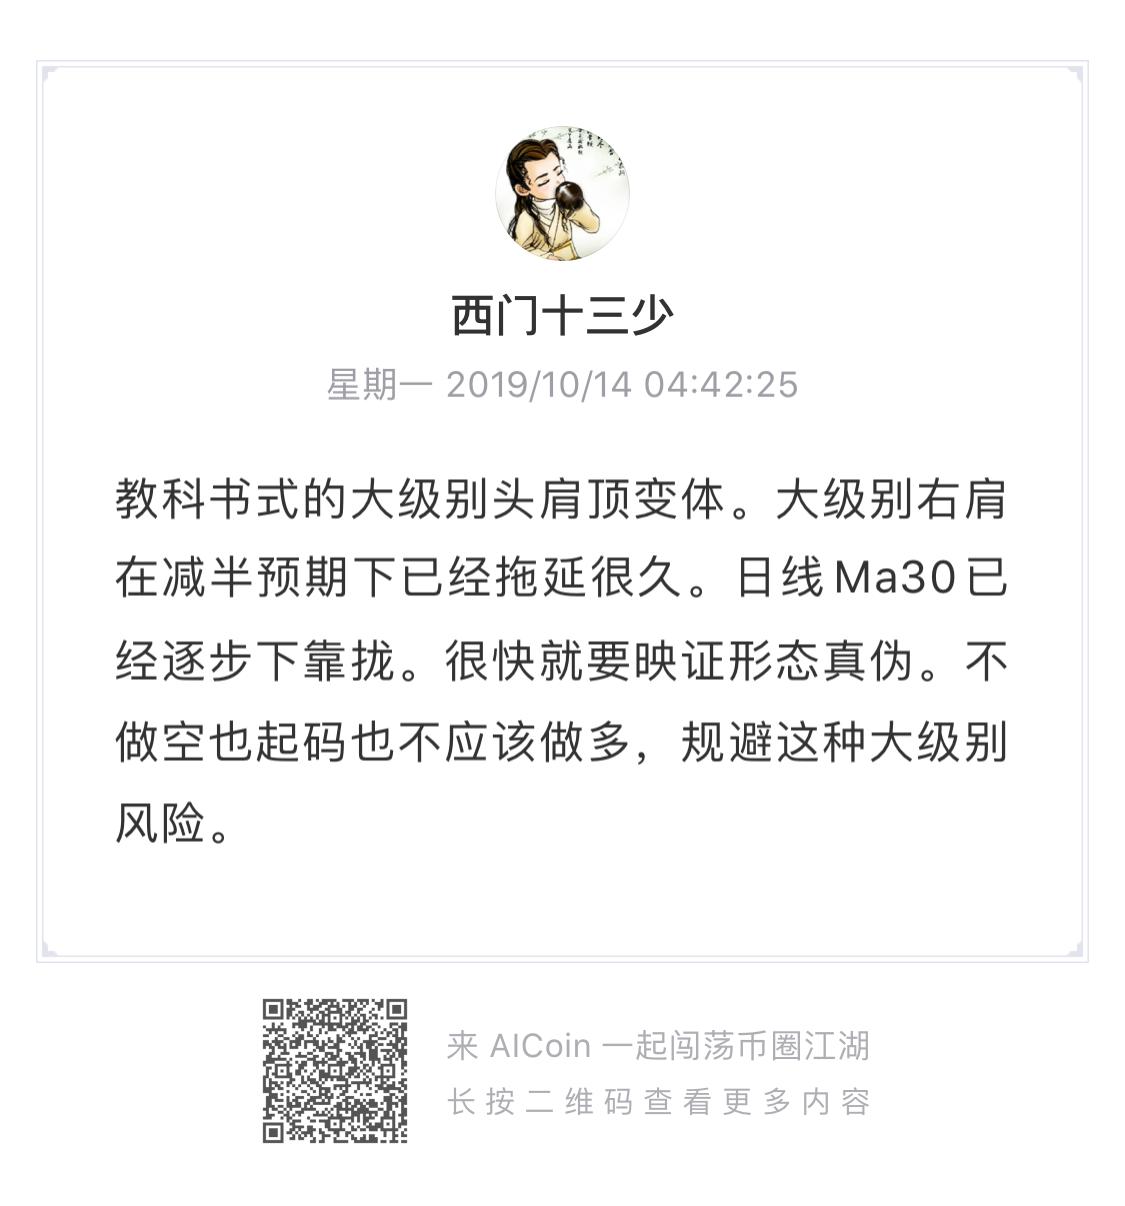 AICoin 广场一周盘点:他们为什么能躲过本周的三次大跌?_aicoin_图4